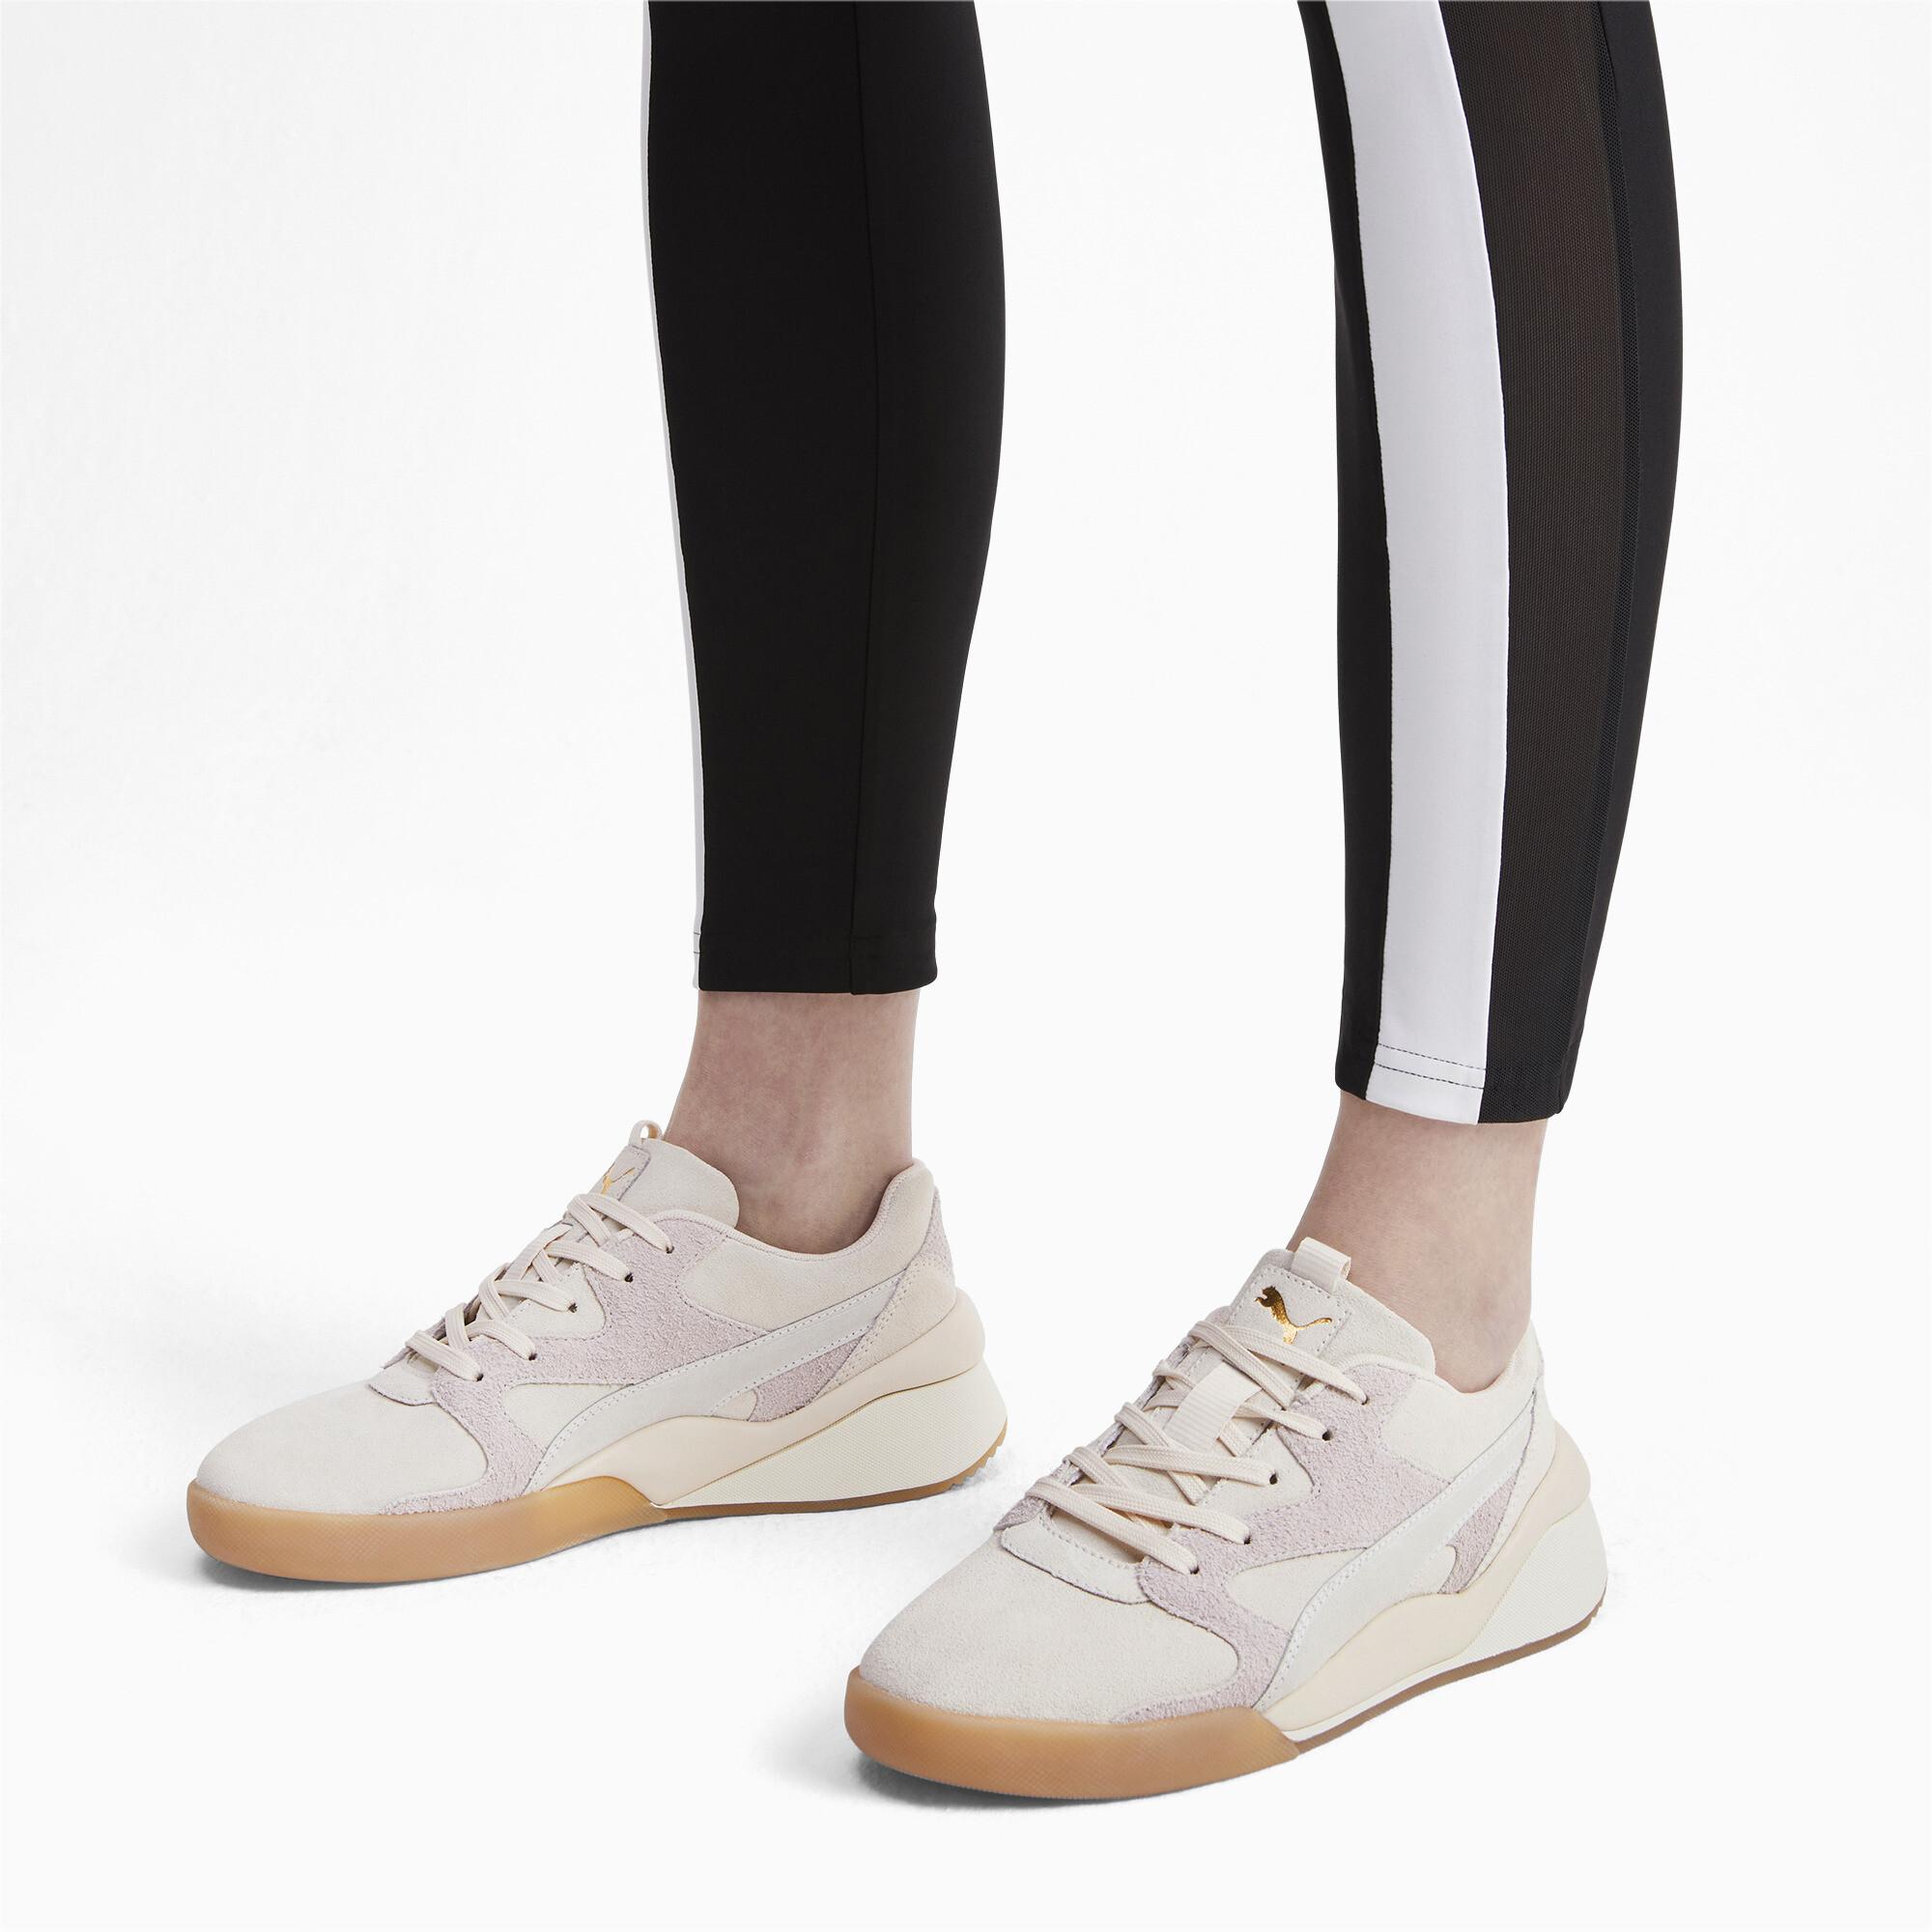 PUMA-Women-039-s-Aeon-Rewind-Sneakers thumbnail 5